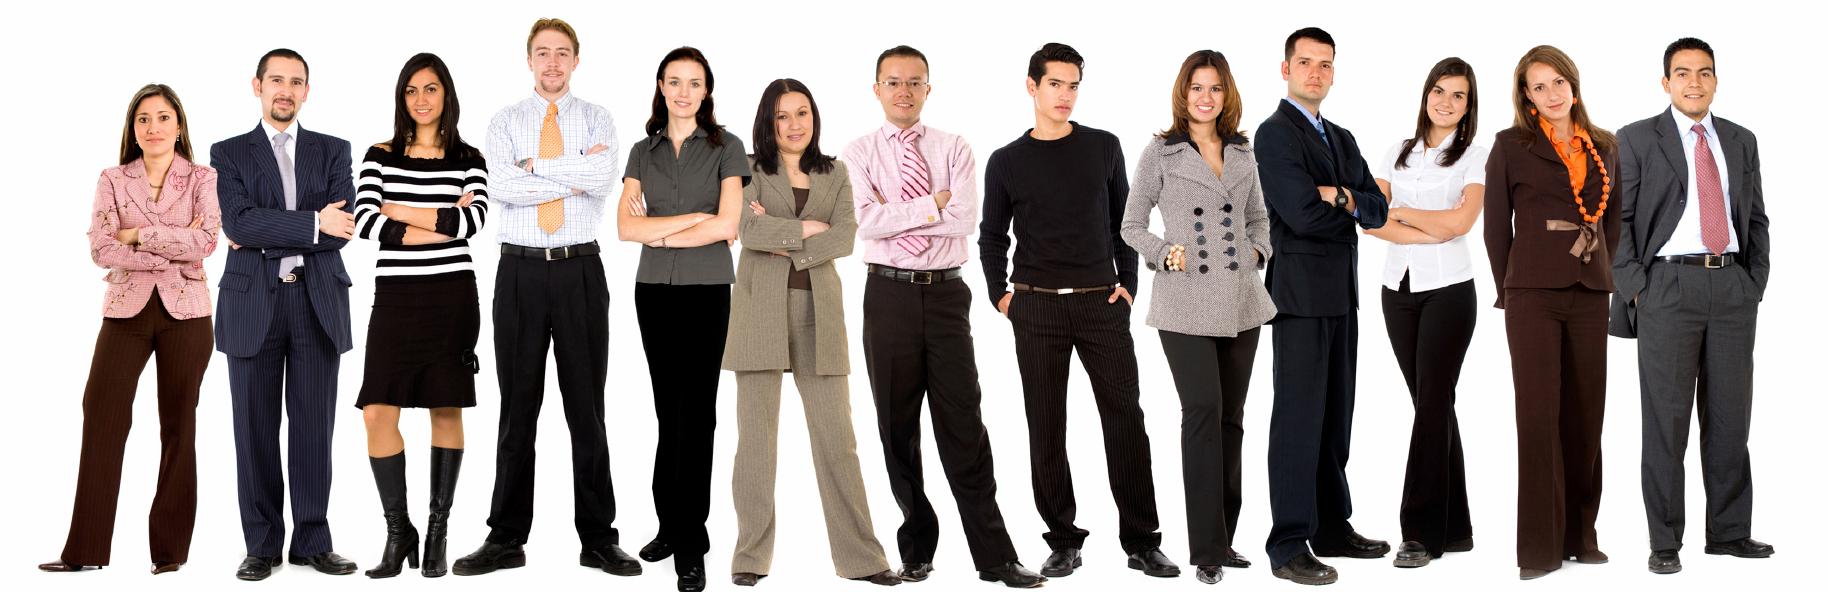 business-people-group1.jpg